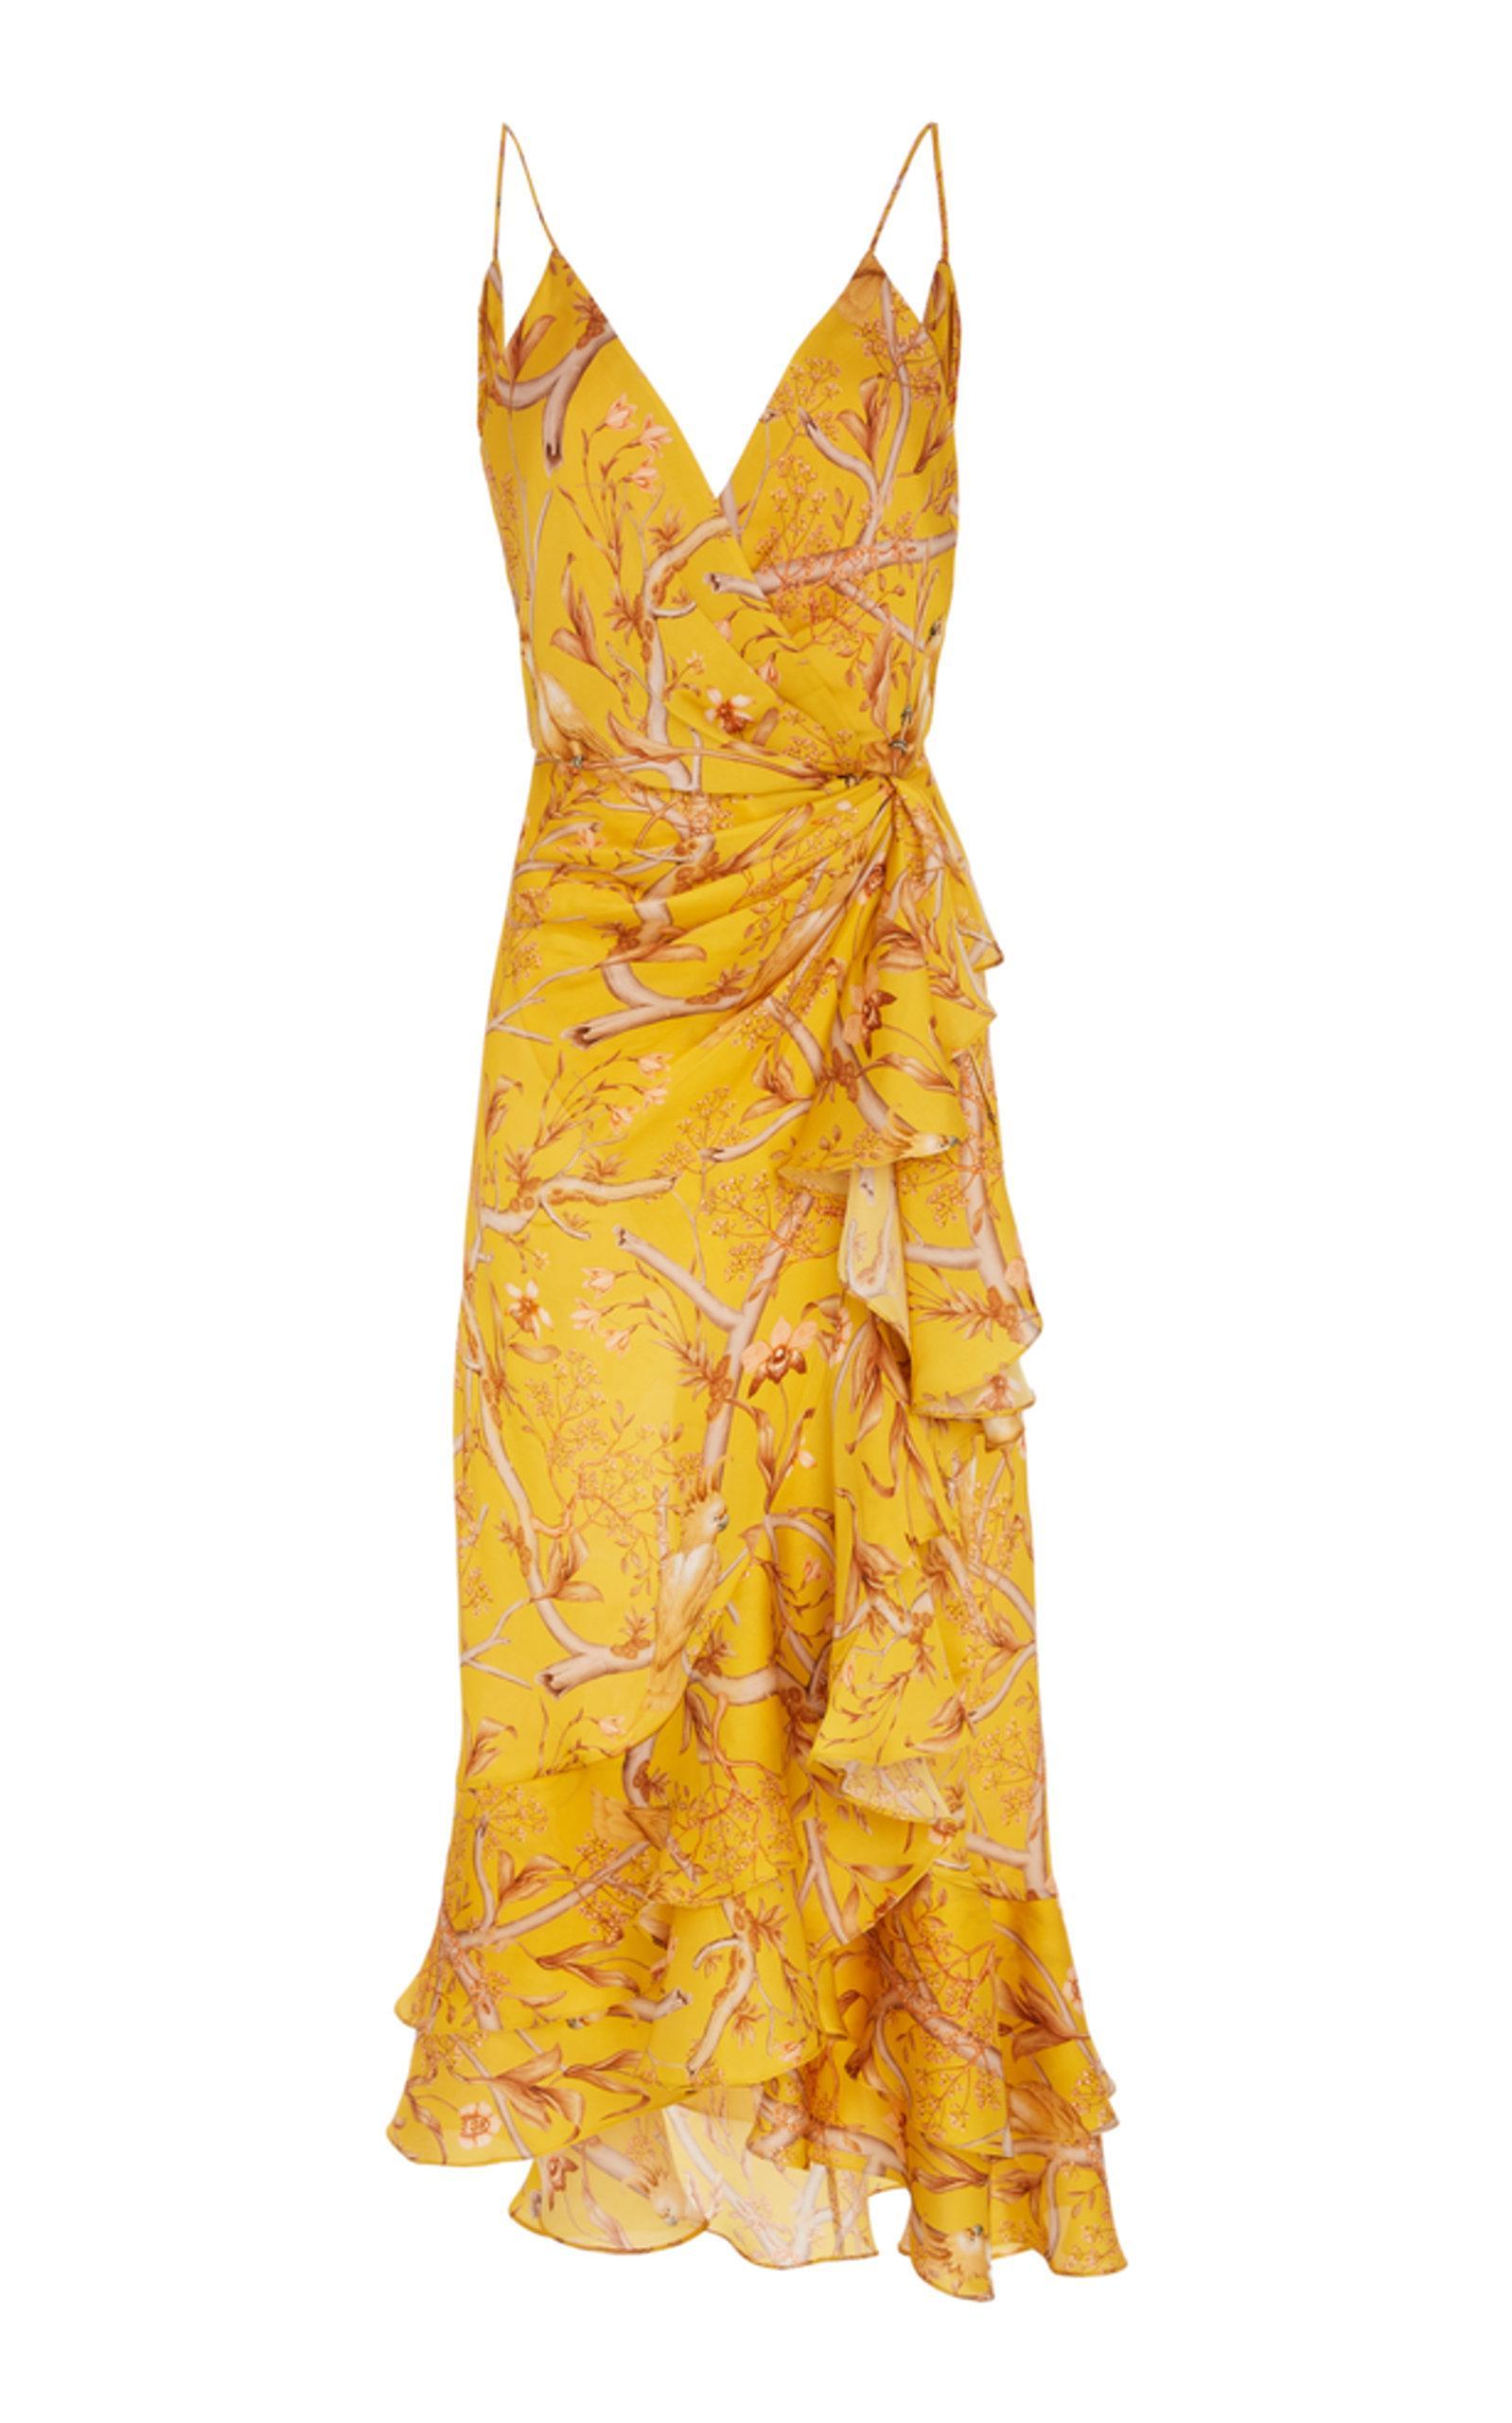 83d6cf474b8 Johanna Ortiz Milagro De Miel Wrap-Effect Printed Dress In Yellow ...